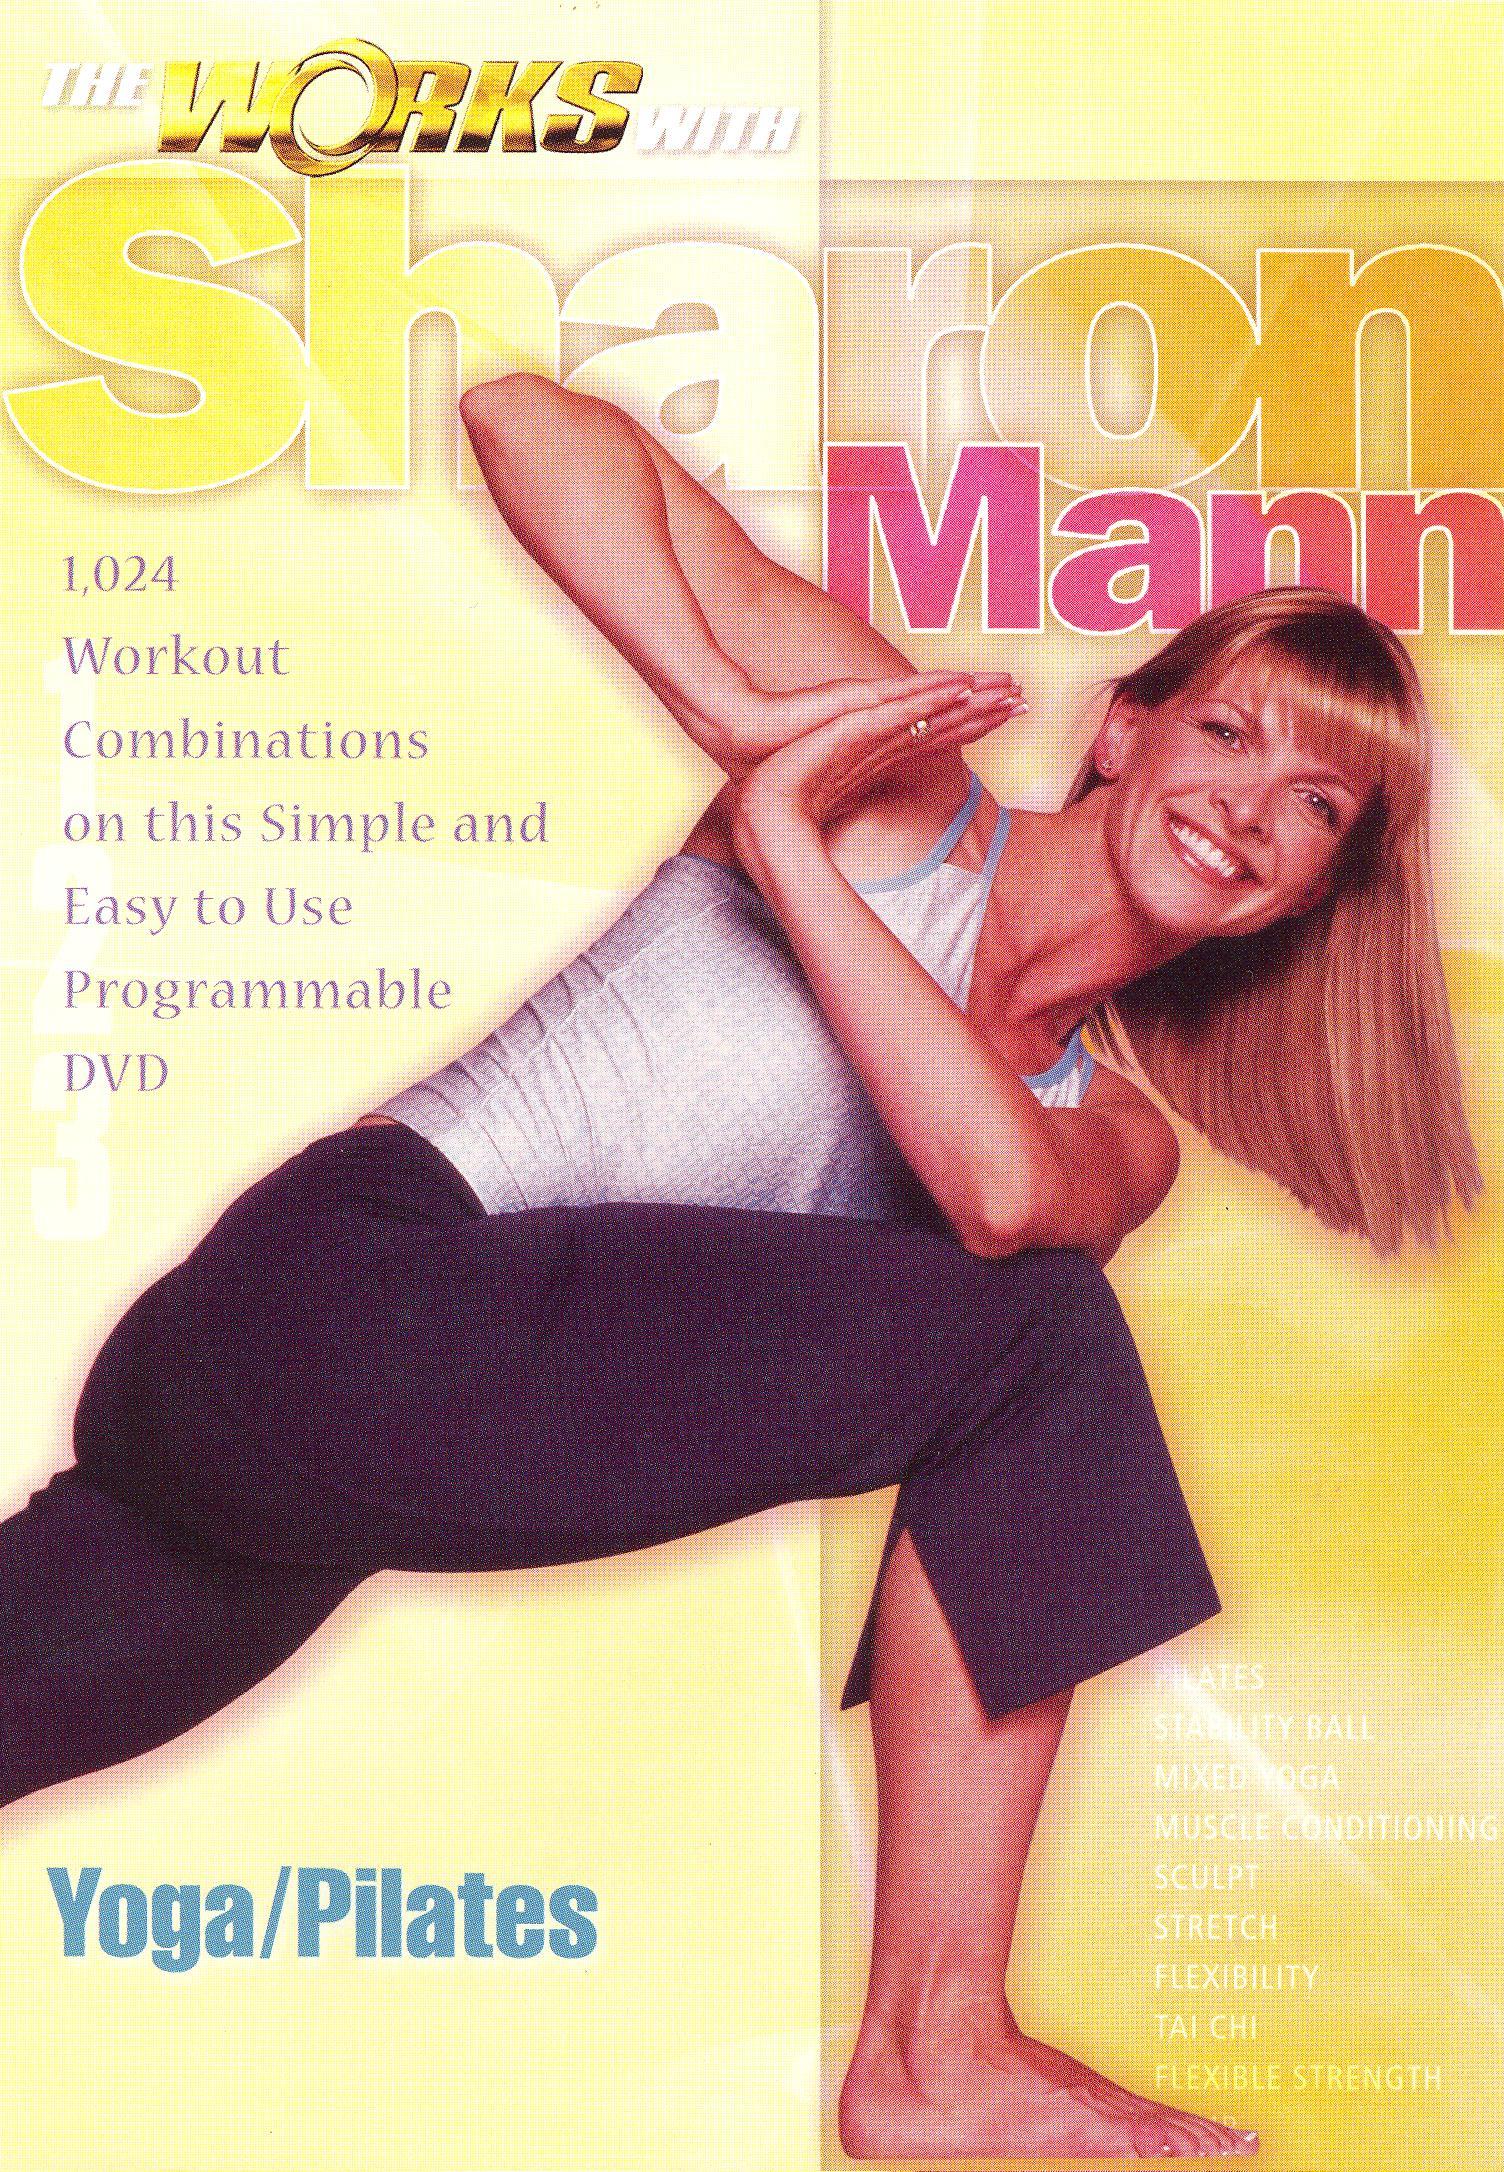 Sharon Mann: The Works - Yoga/Pilates